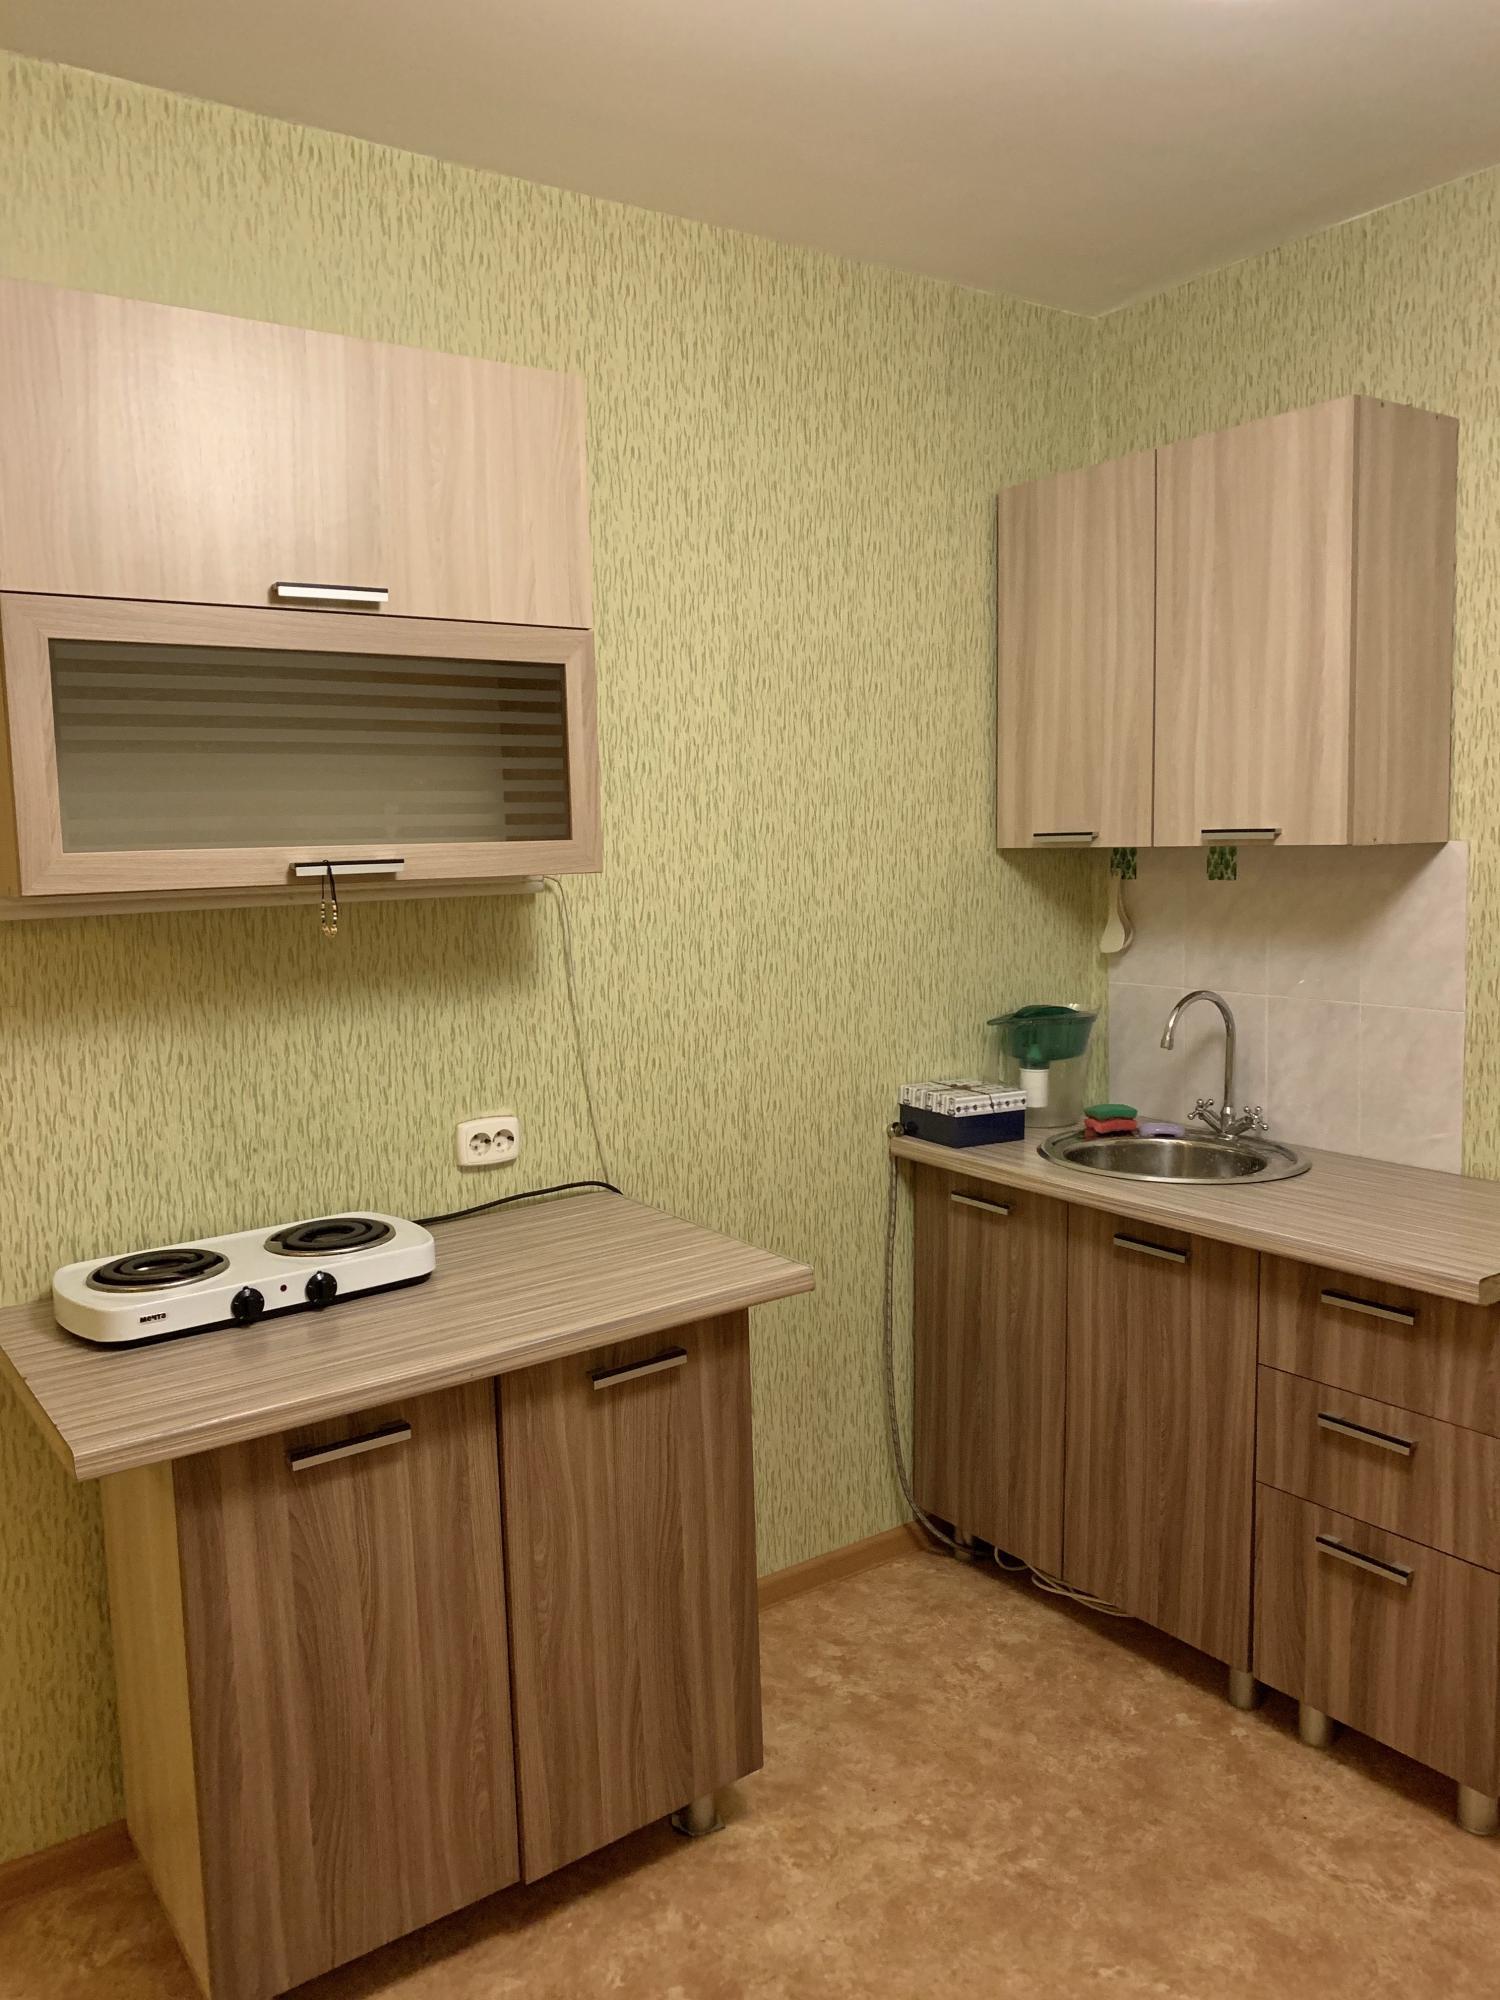 1к квартира Лесопарковая улица | 12000 | аренда в Красноярске фото 3